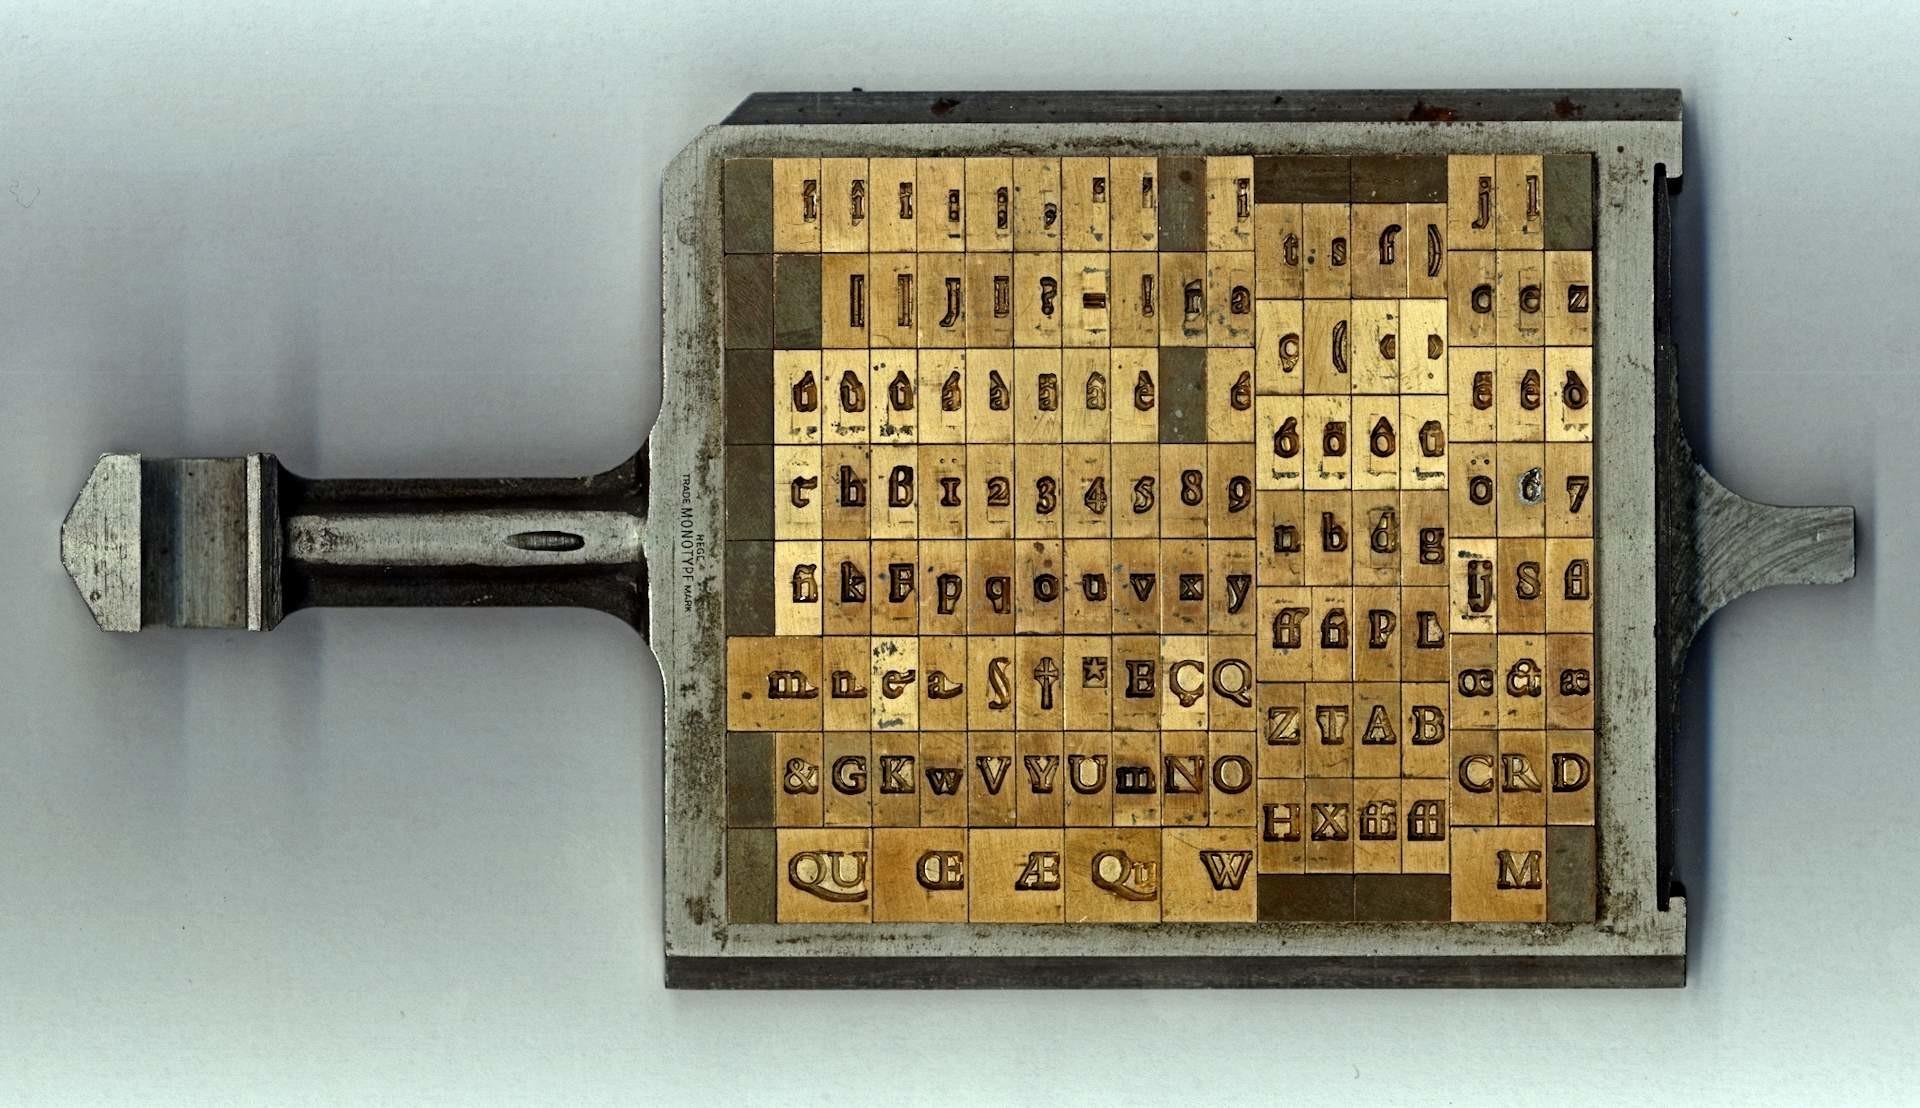 Matrixcase-bembo-16pts (CC0 license) 1920px